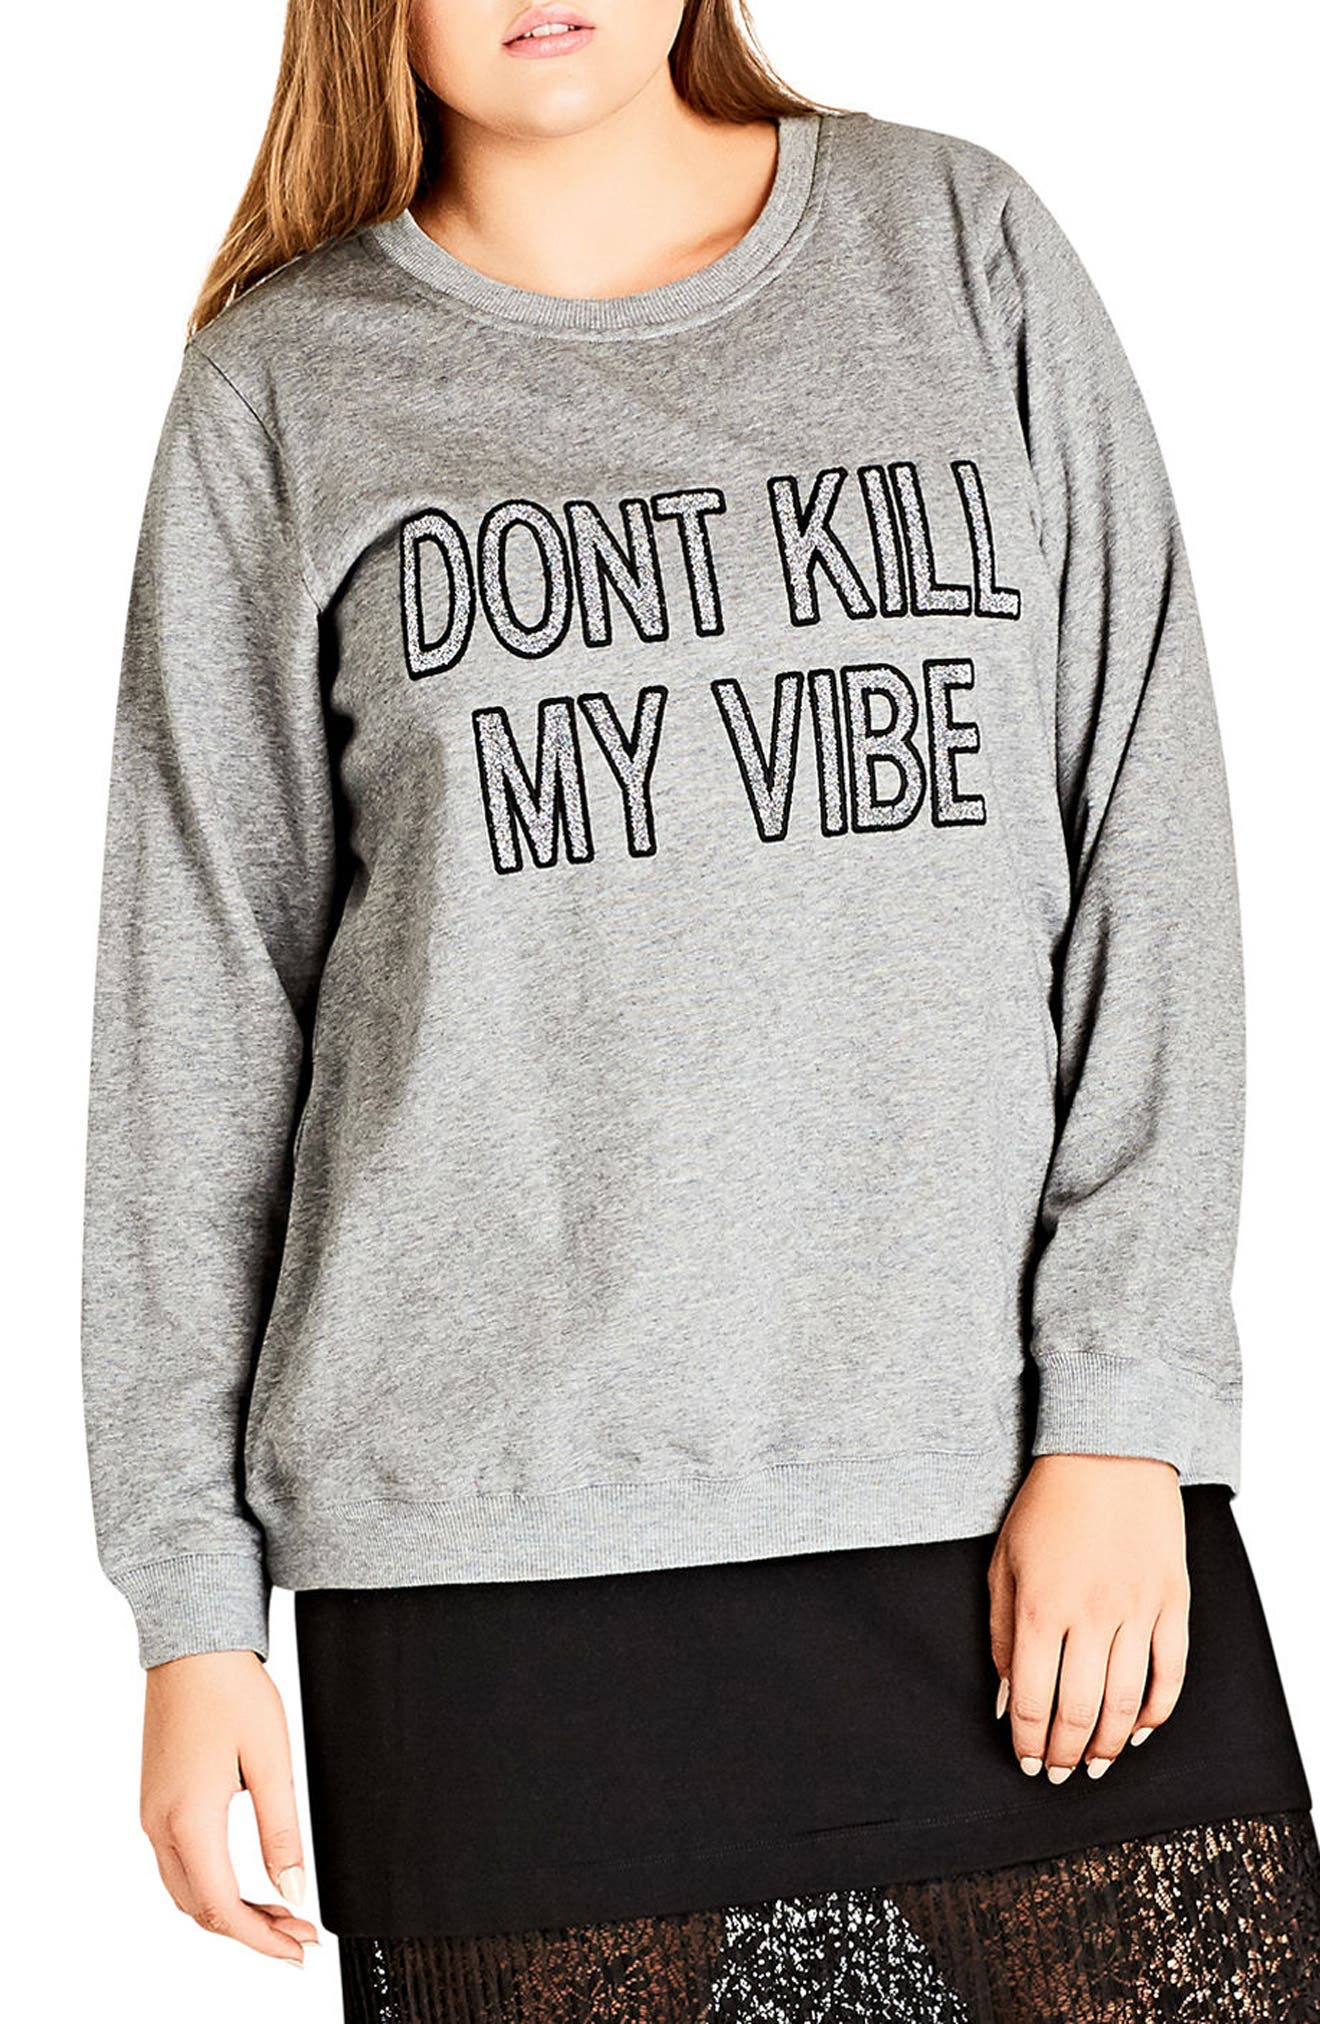 Main Image - City Chic Vibes Glitter Graphic Sweatshirt (Plus Size)